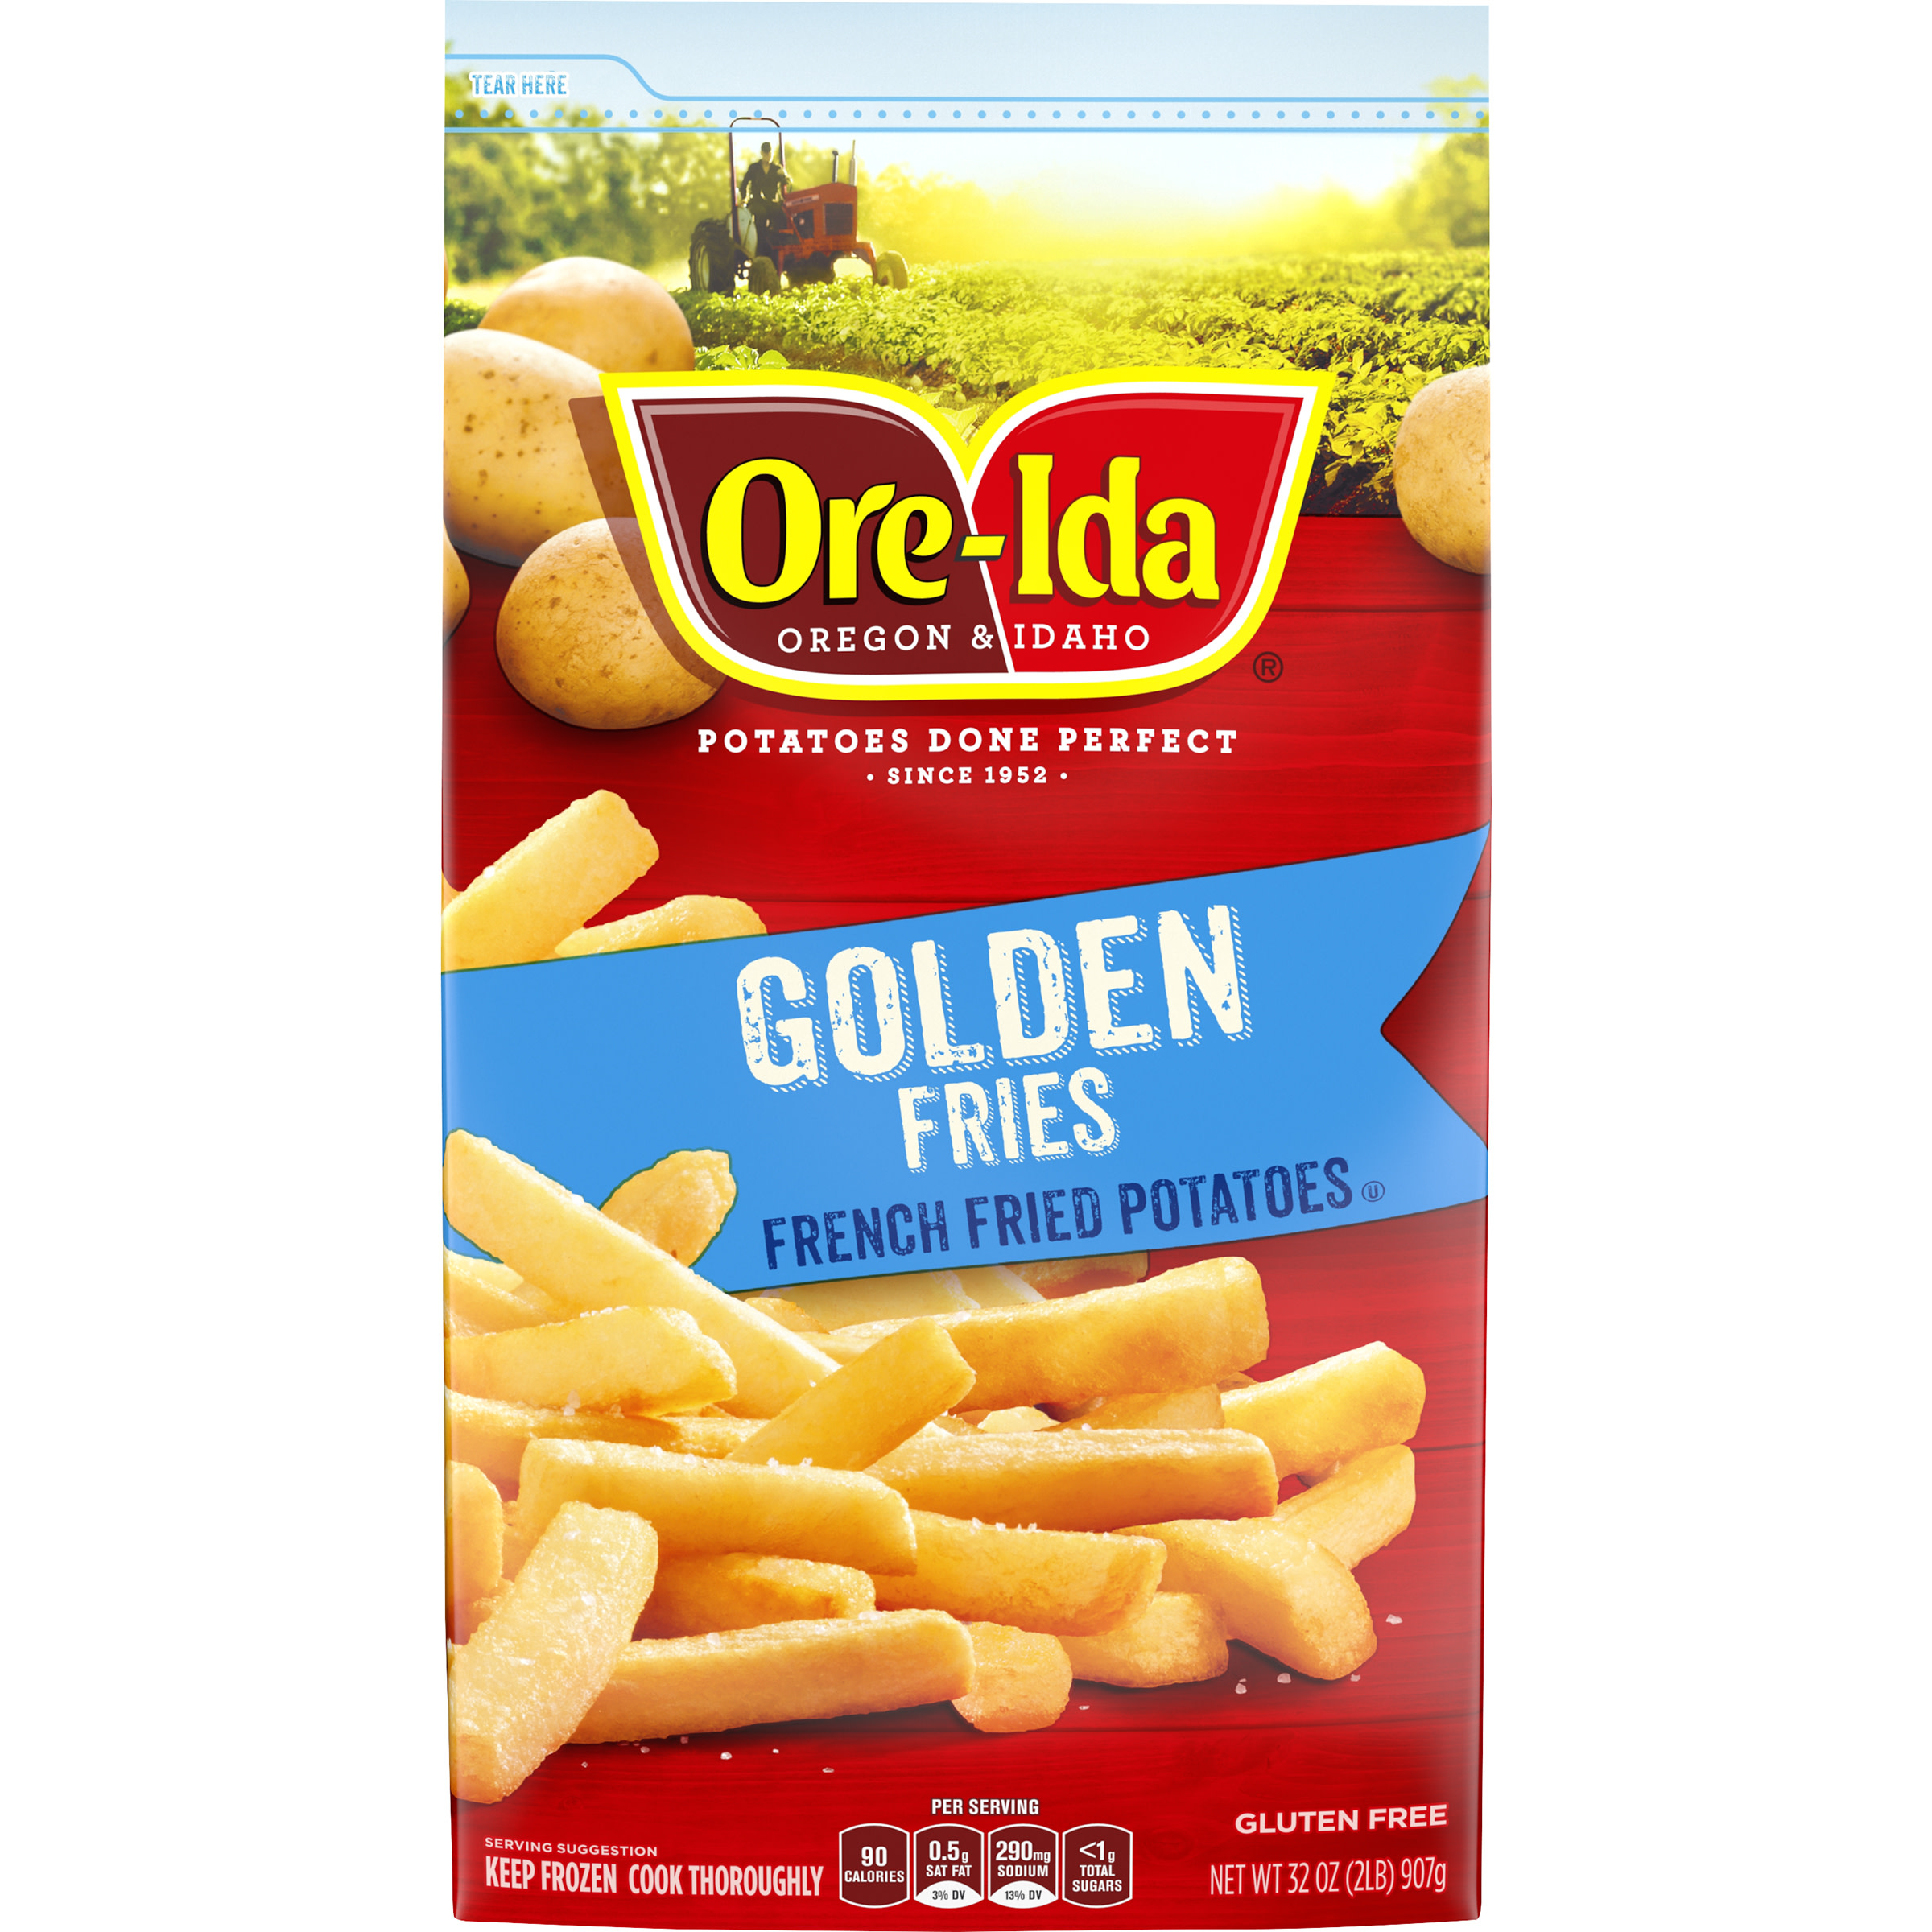 bag of frozen ore-ida french fries